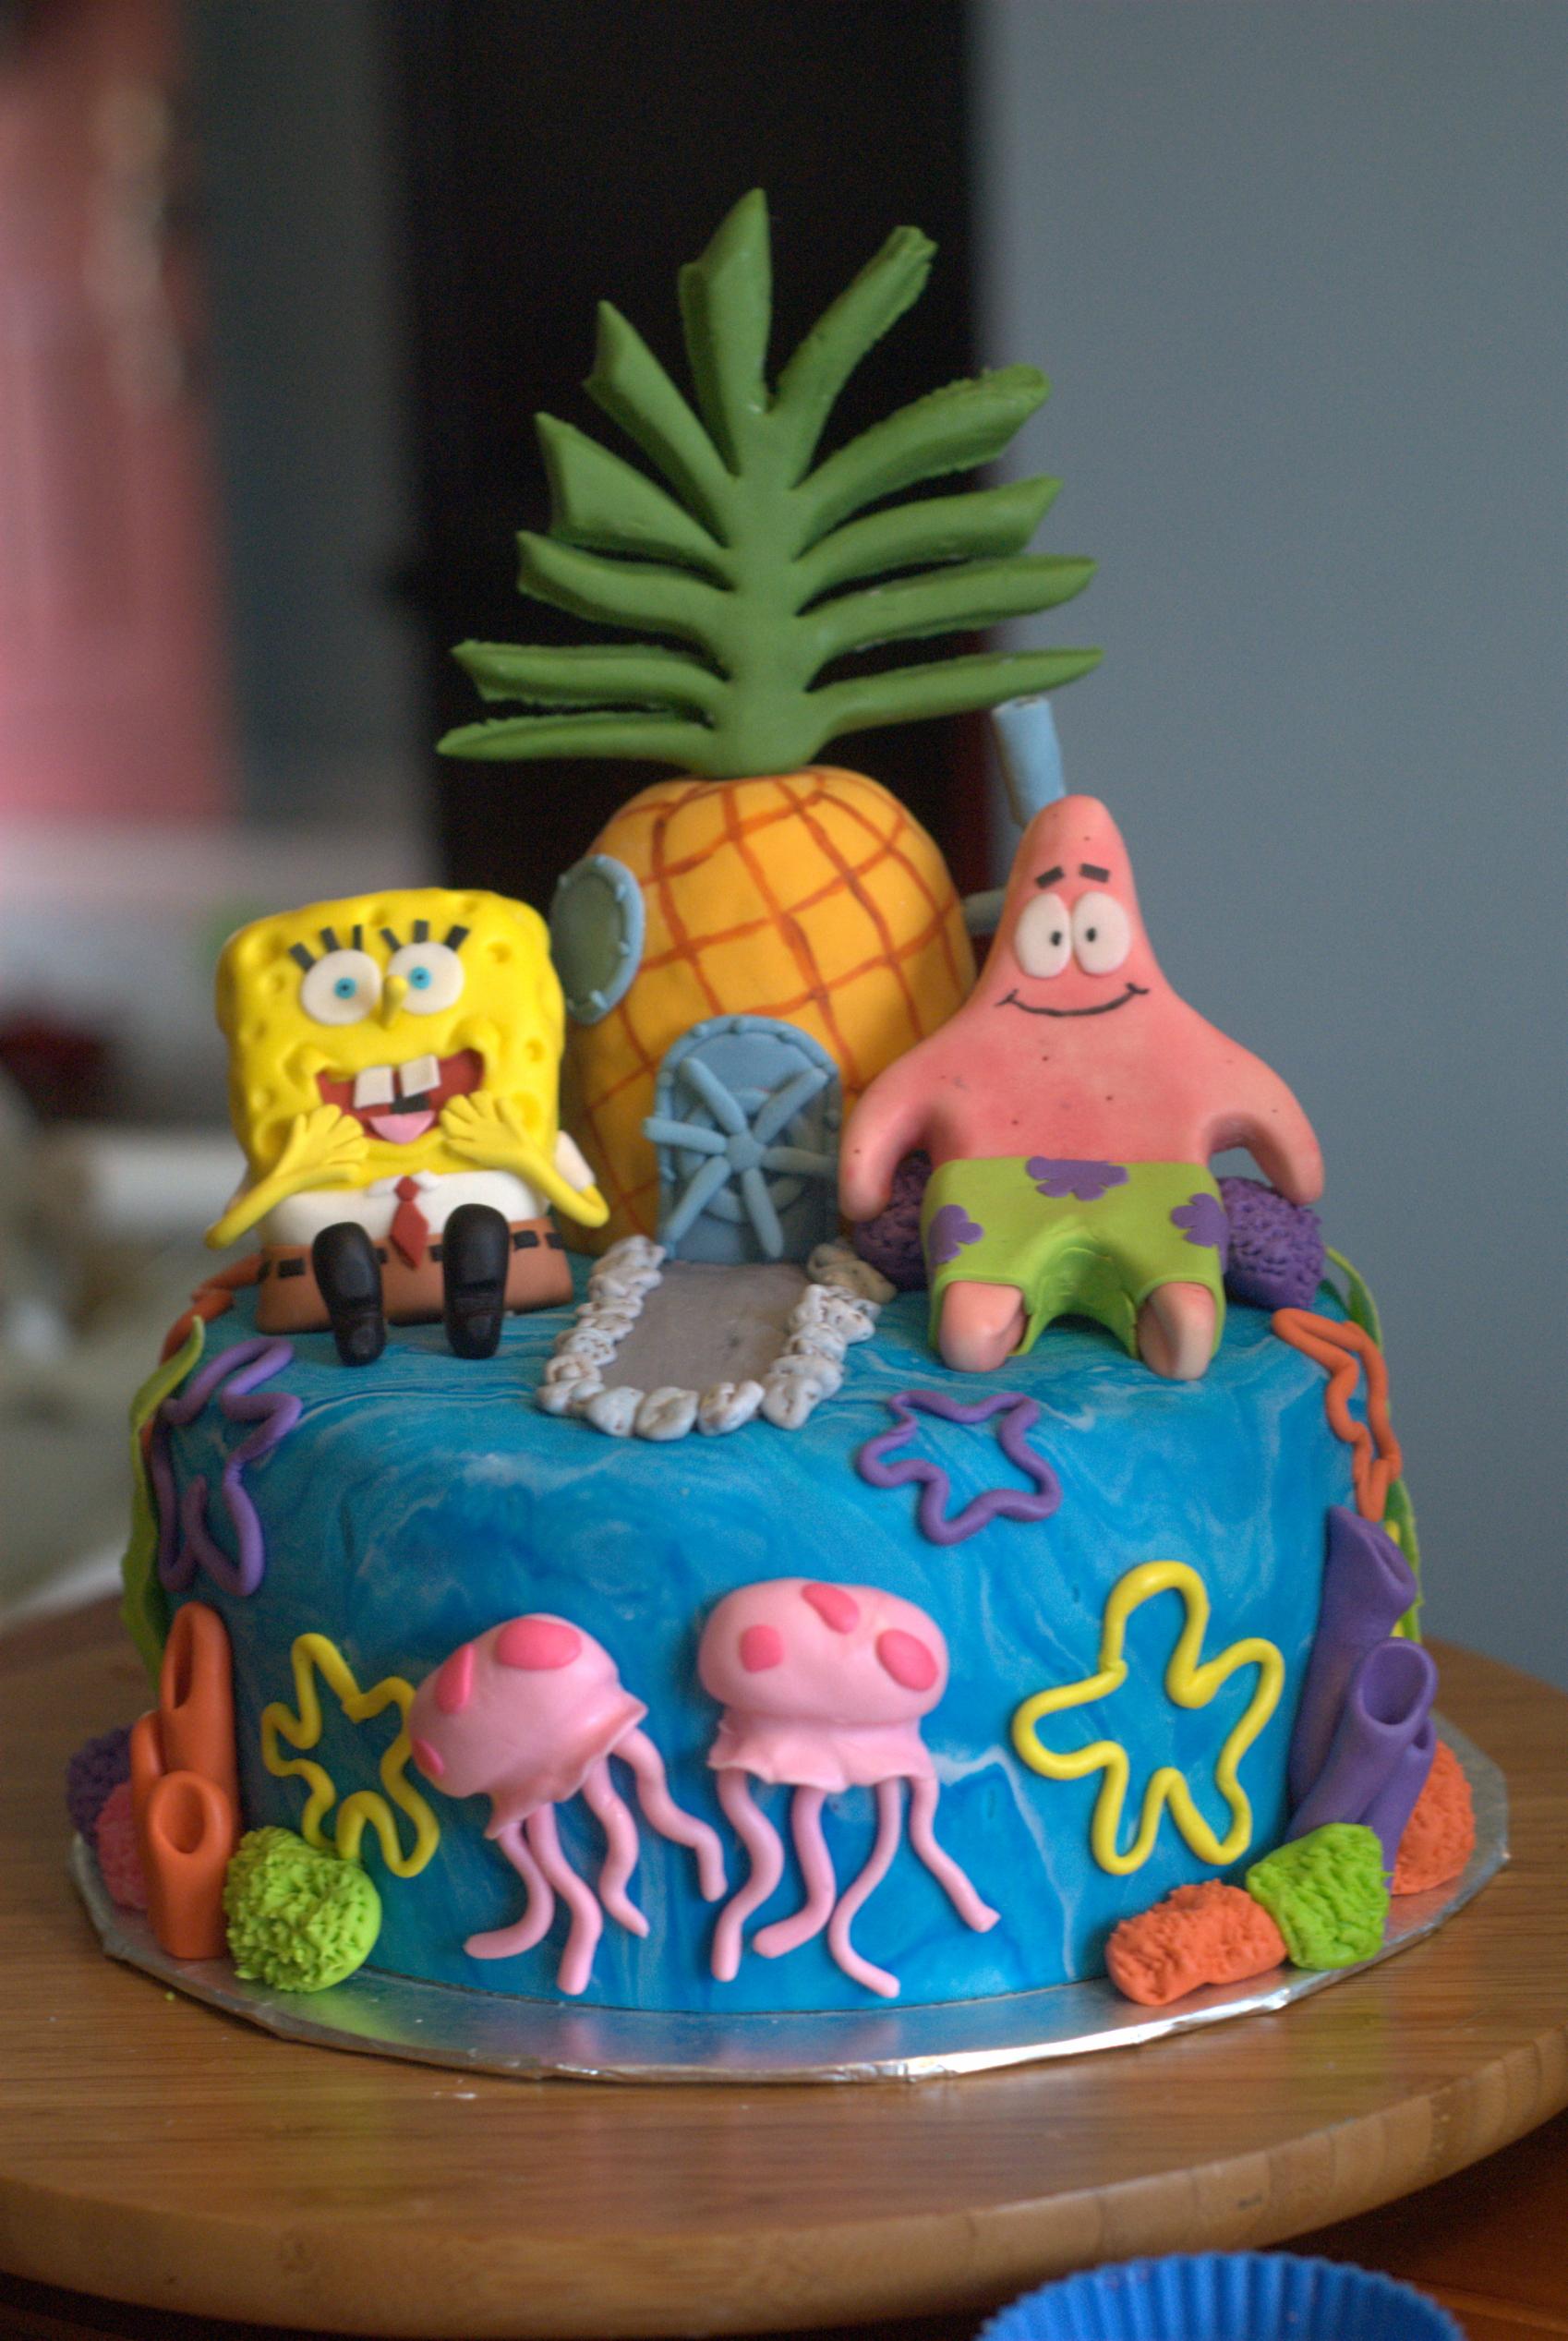 Prime 8 Spongebob Squarepants Birthday Cakes Photo Spongebob Birthday Funny Birthday Cards Online Alyptdamsfinfo